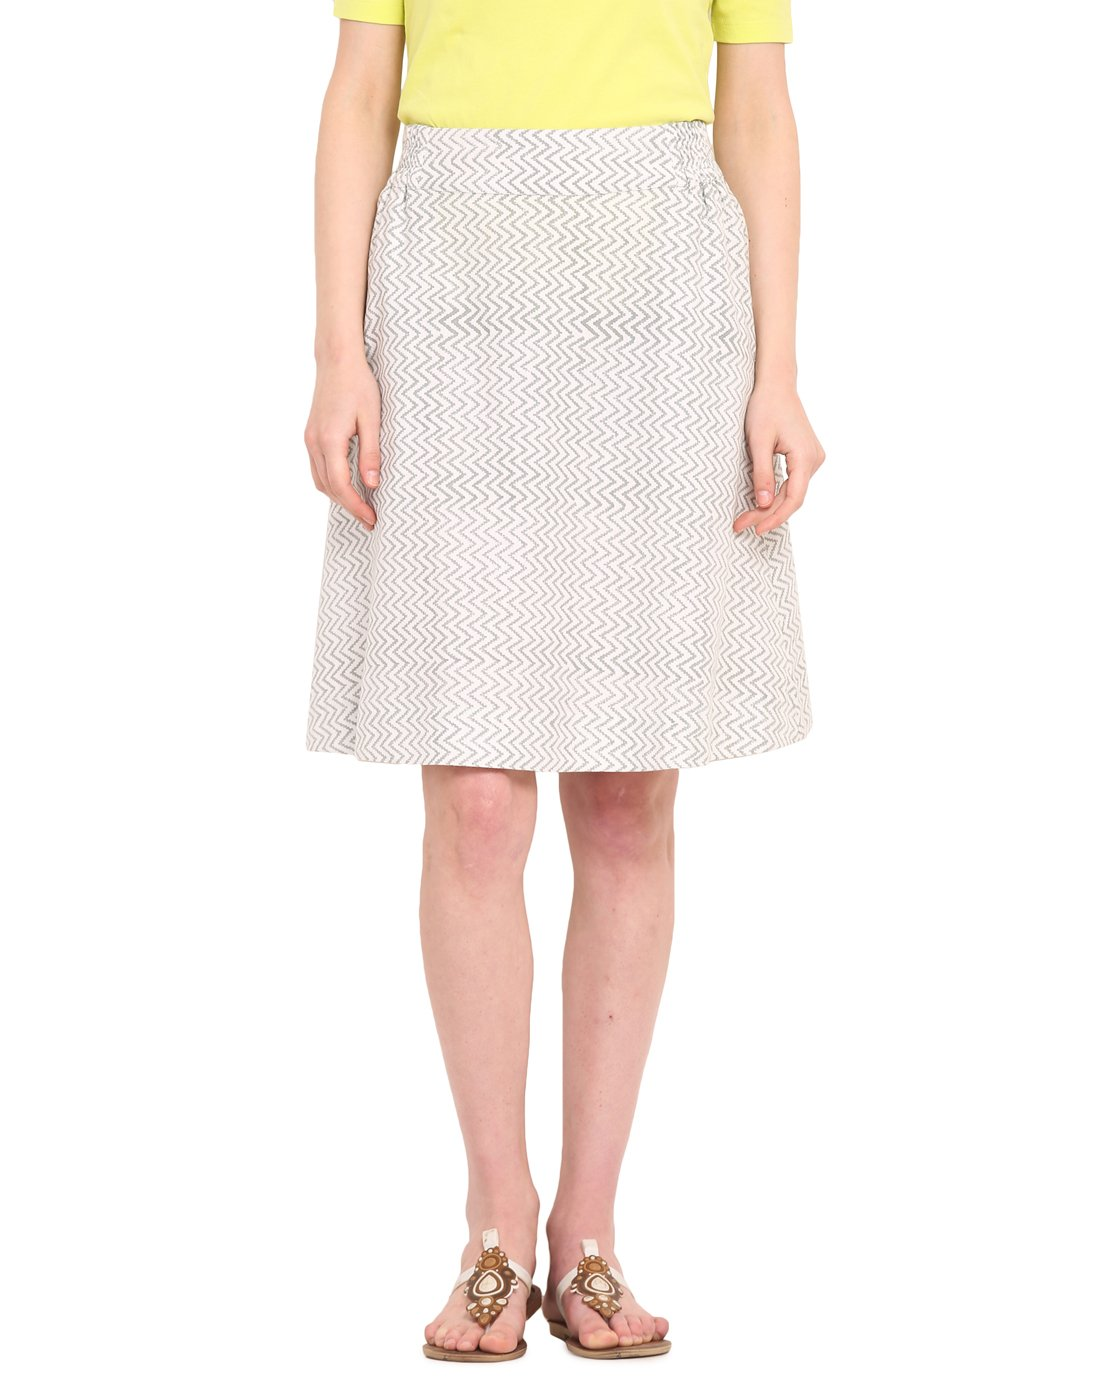 Saiesta Women's Eye Zig-Zag Hand Woven Relaxed Fit A-Line Skirt In Block Print